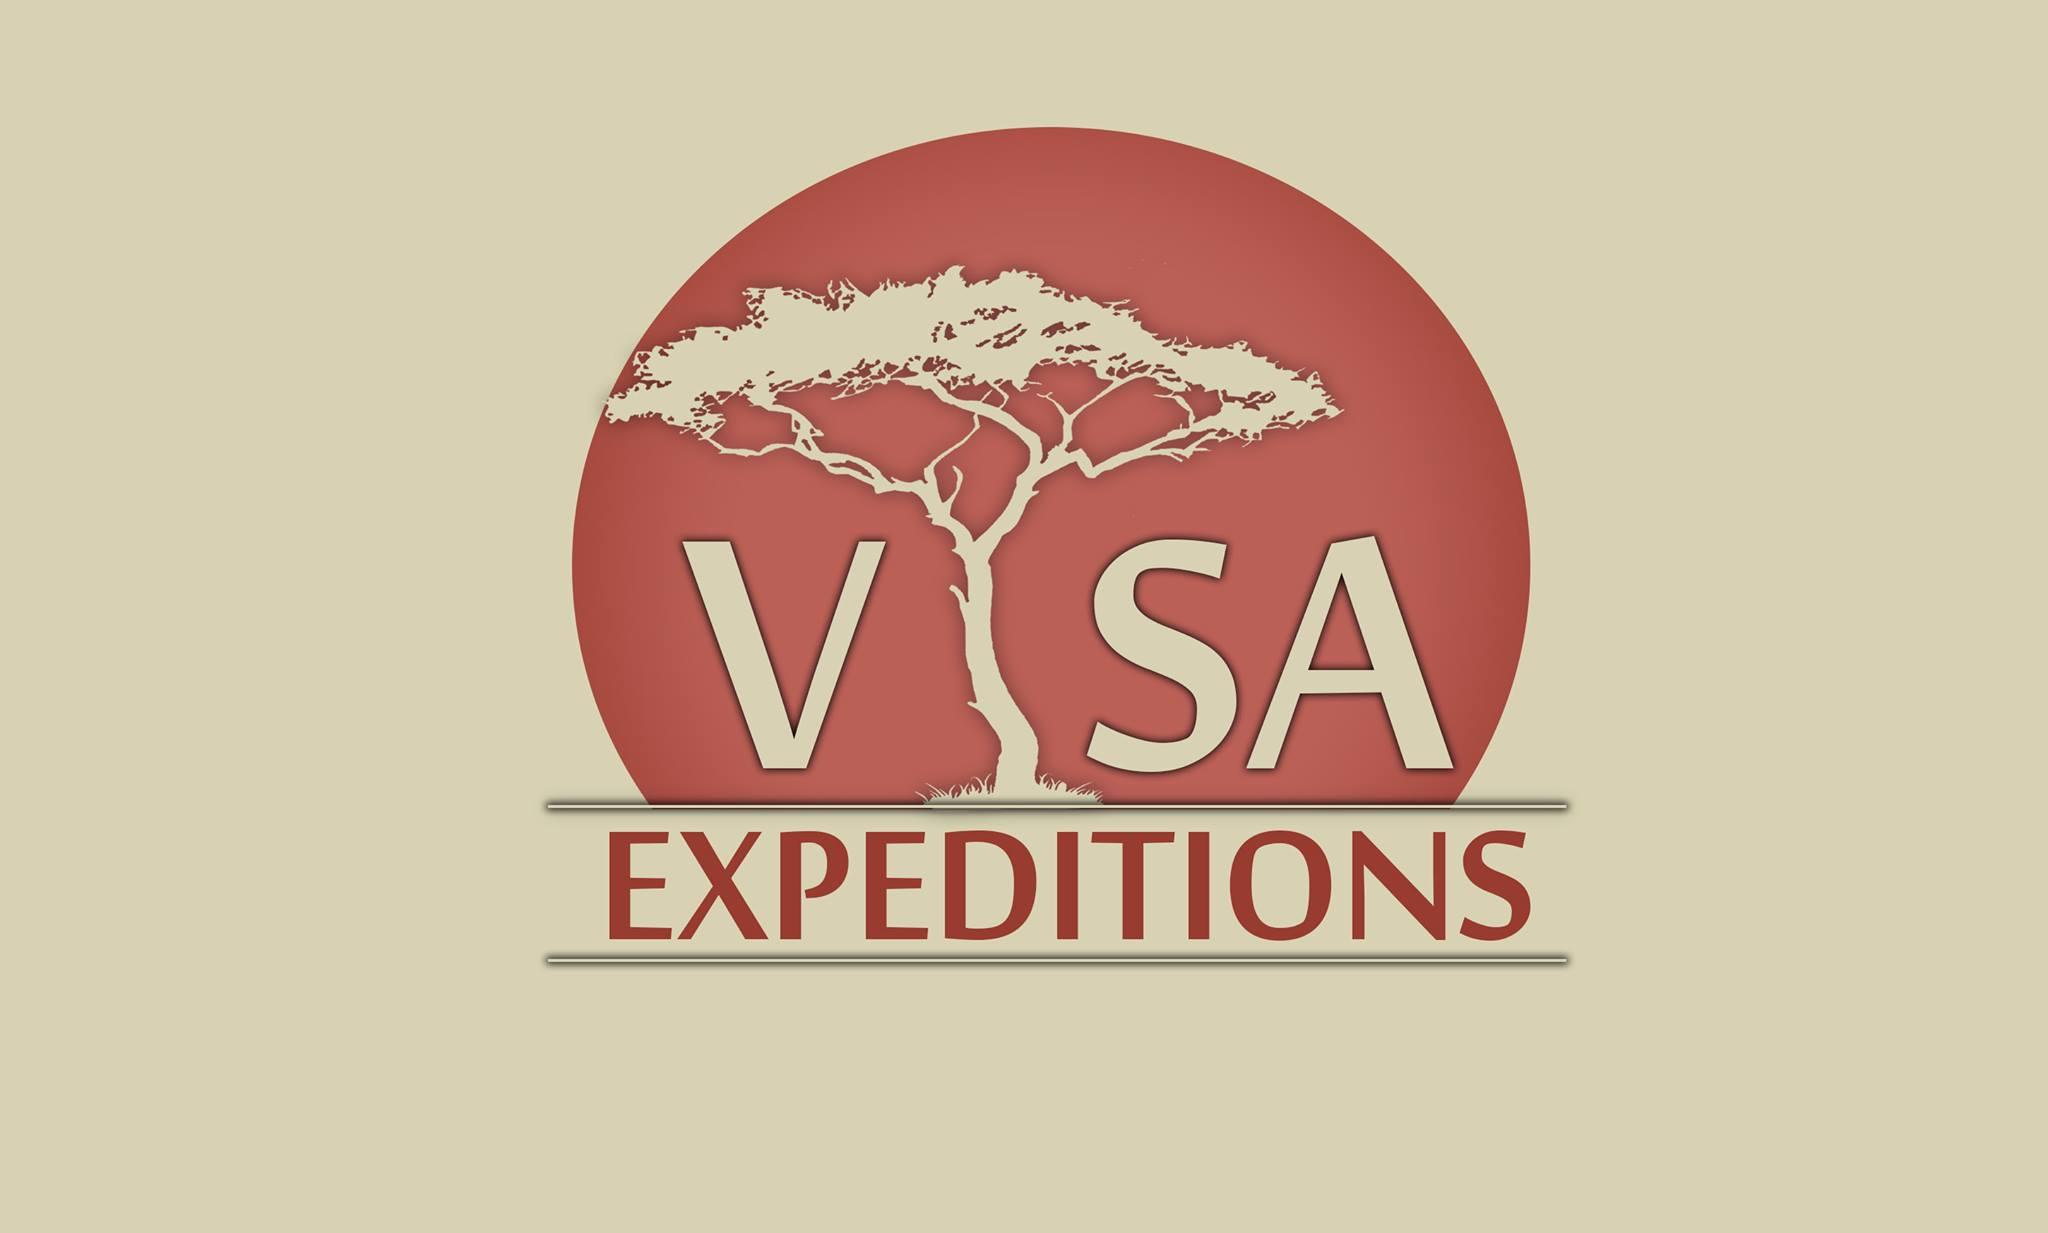 Visa Expeditions Logo